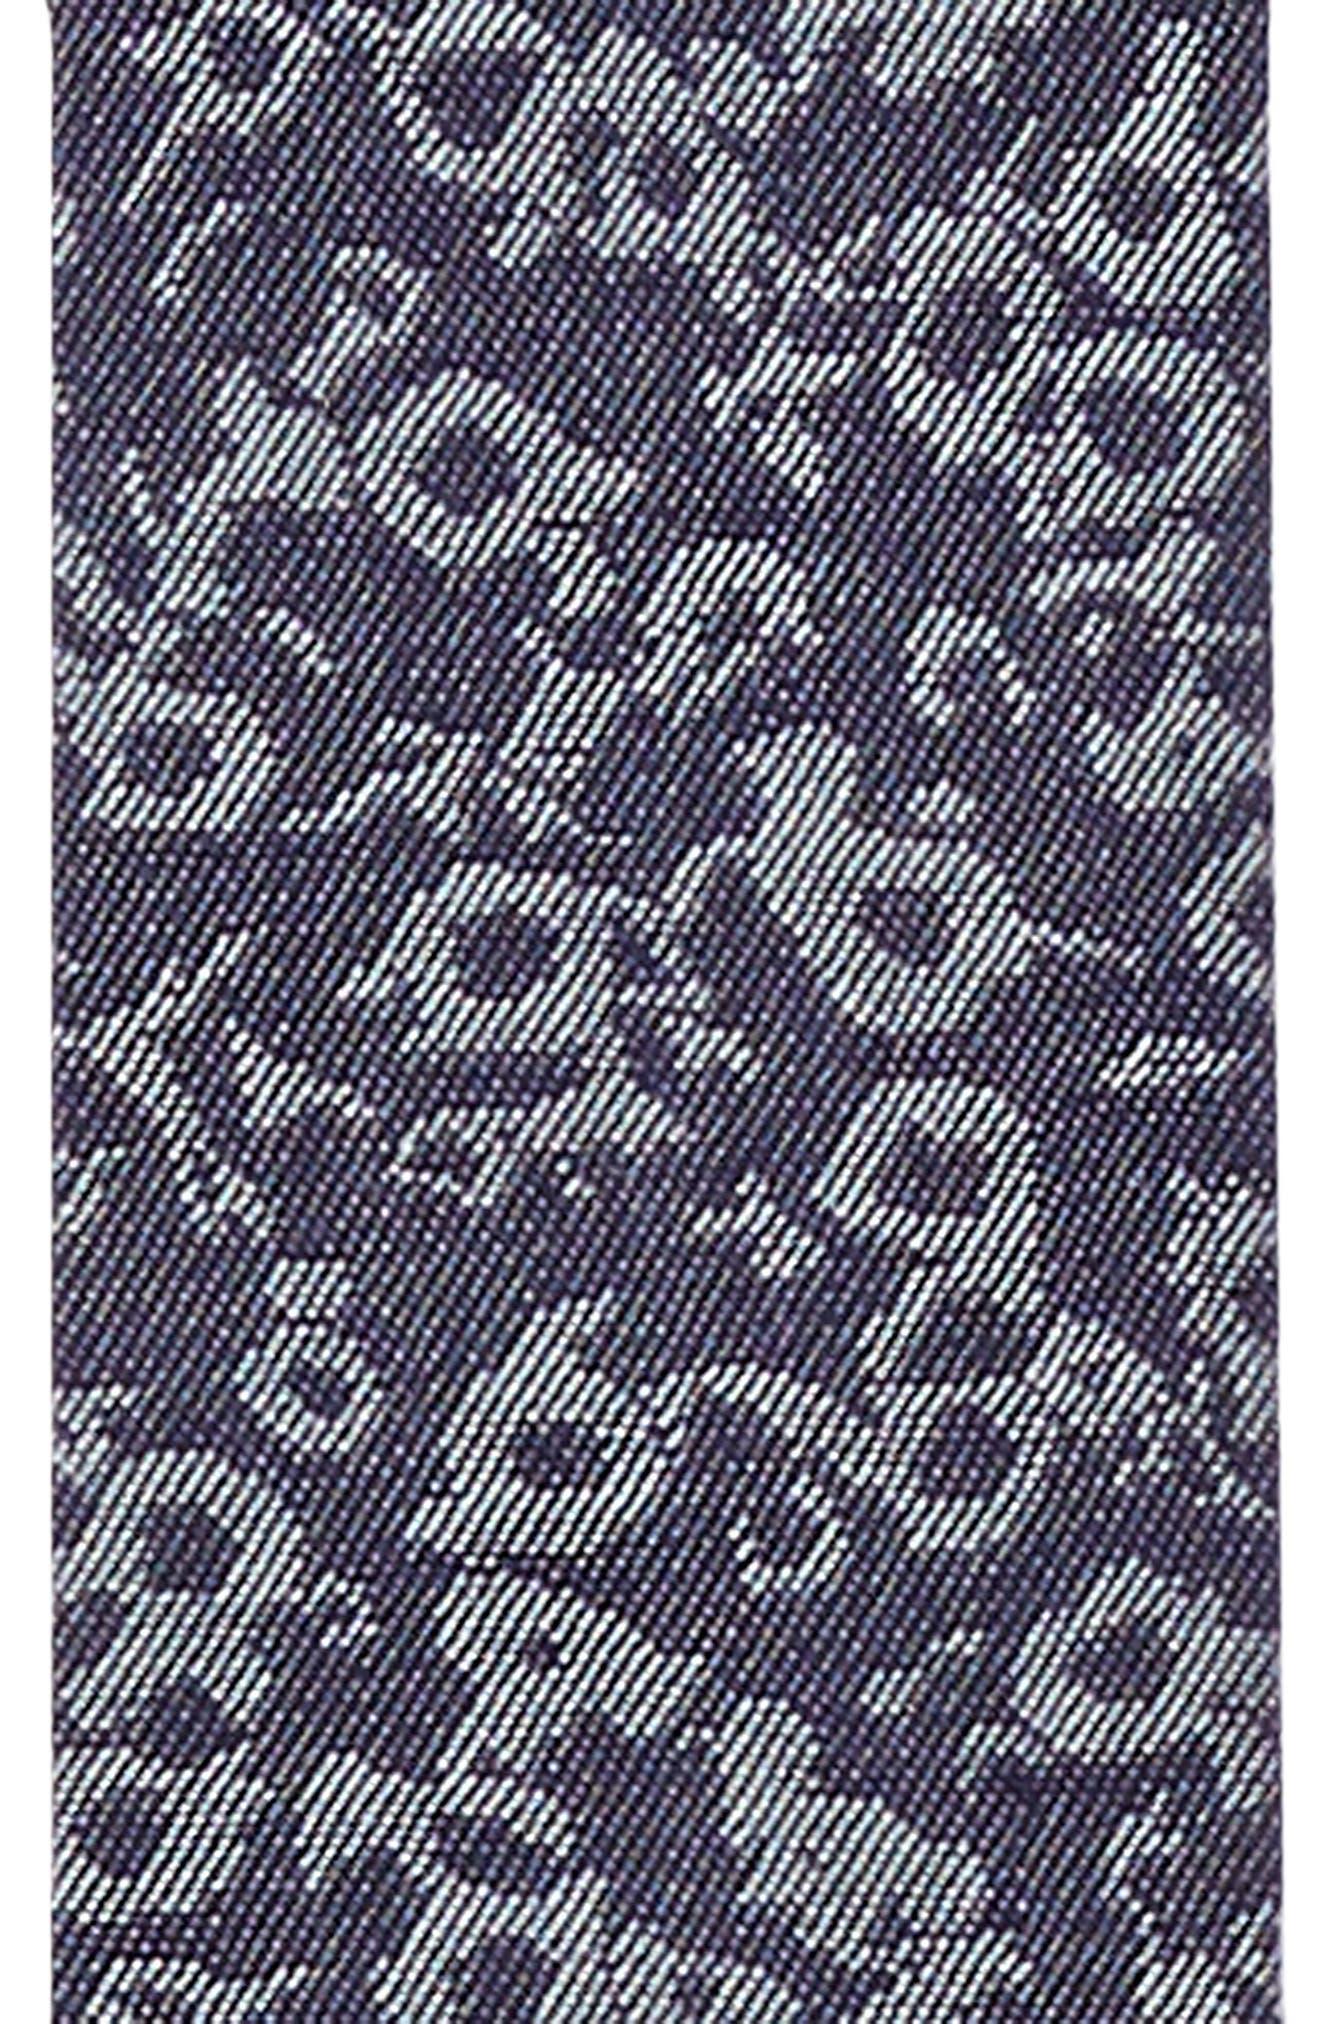 NORDSTROM MEN'S SHOP, Floral Denim Suspenders, Alternate thumbnail 2, color, 420